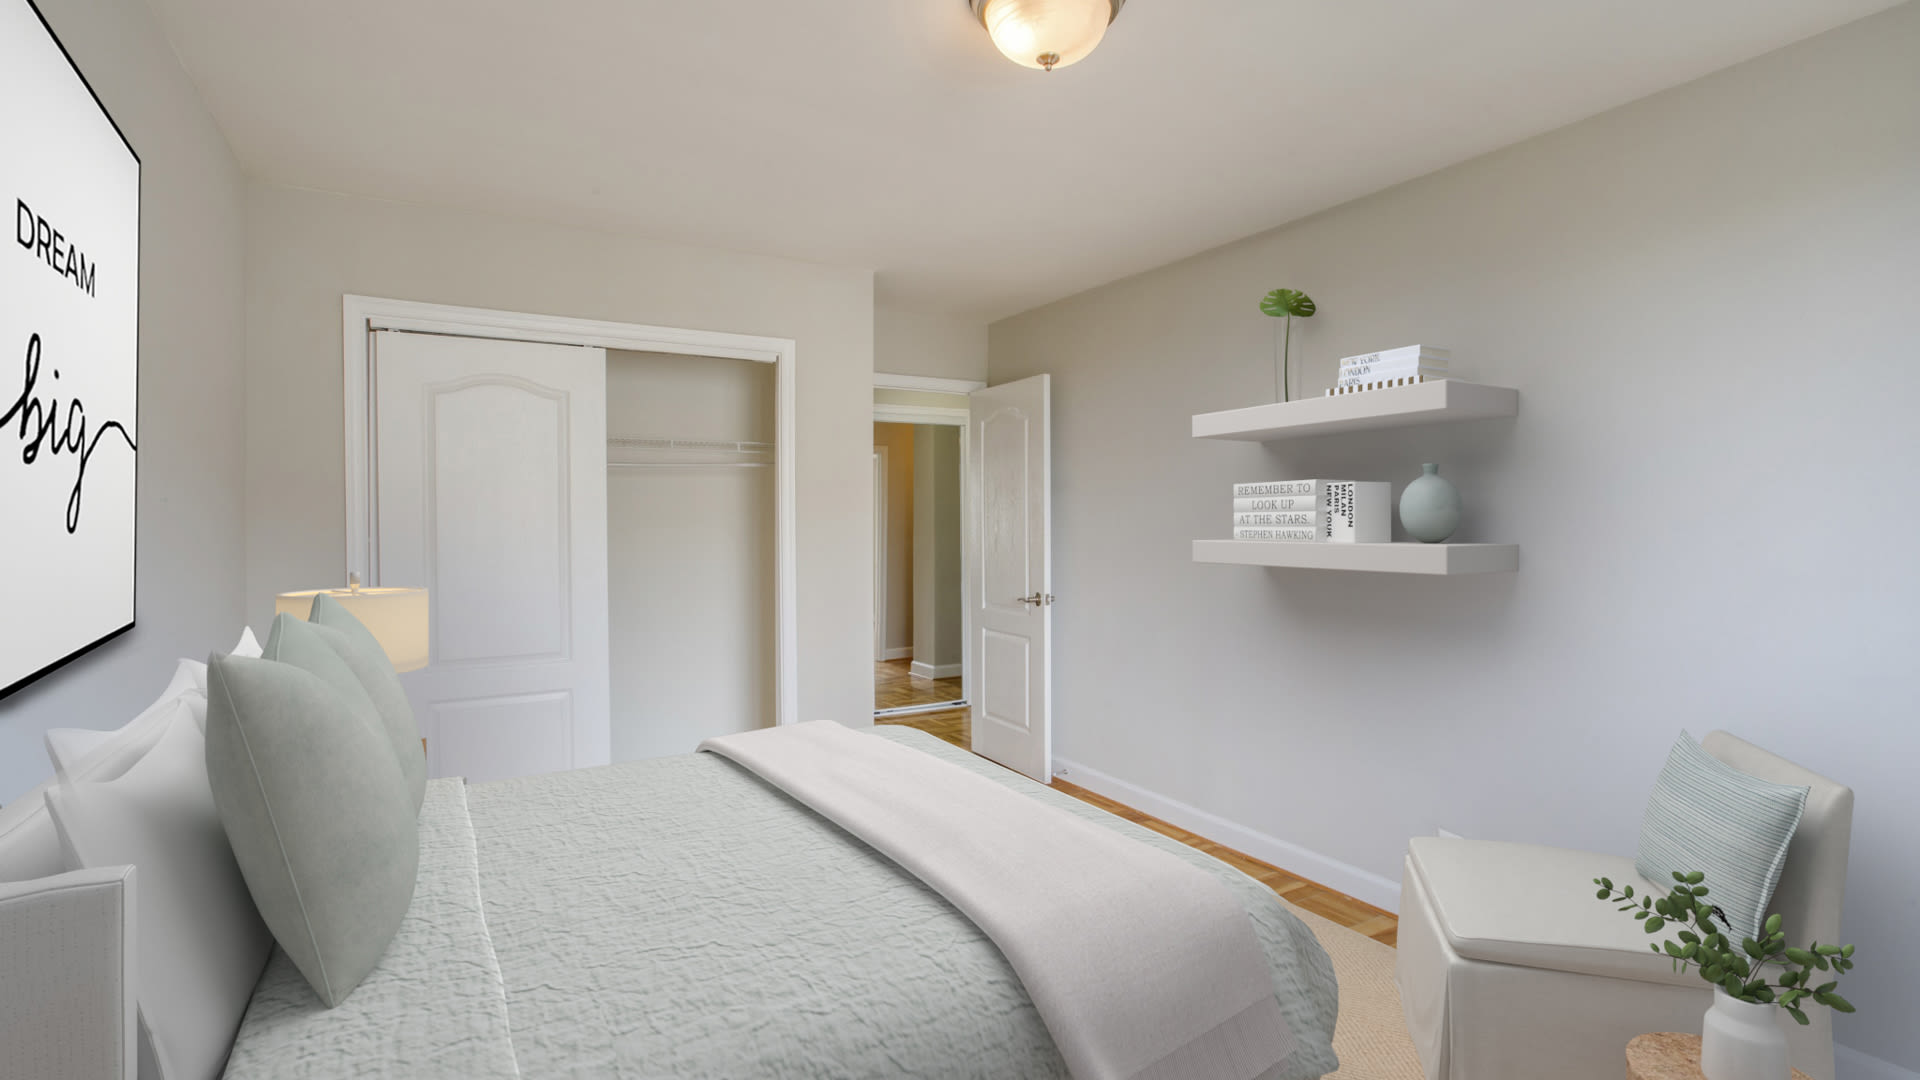 Calvert Woodley Apartments - Bedroom with Parquet Flooring